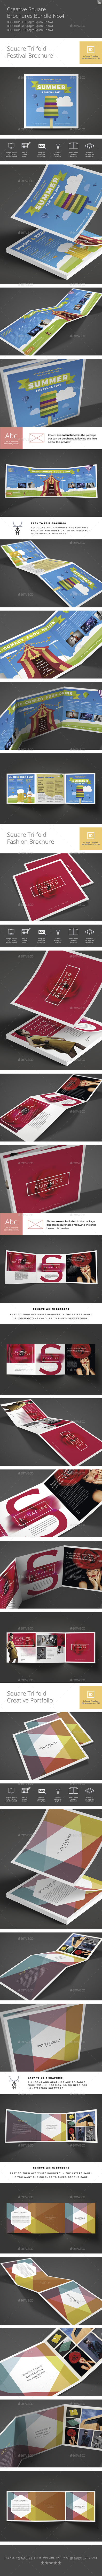 Square Creative Brochures Bundle No.4 - Brochures Print Templates